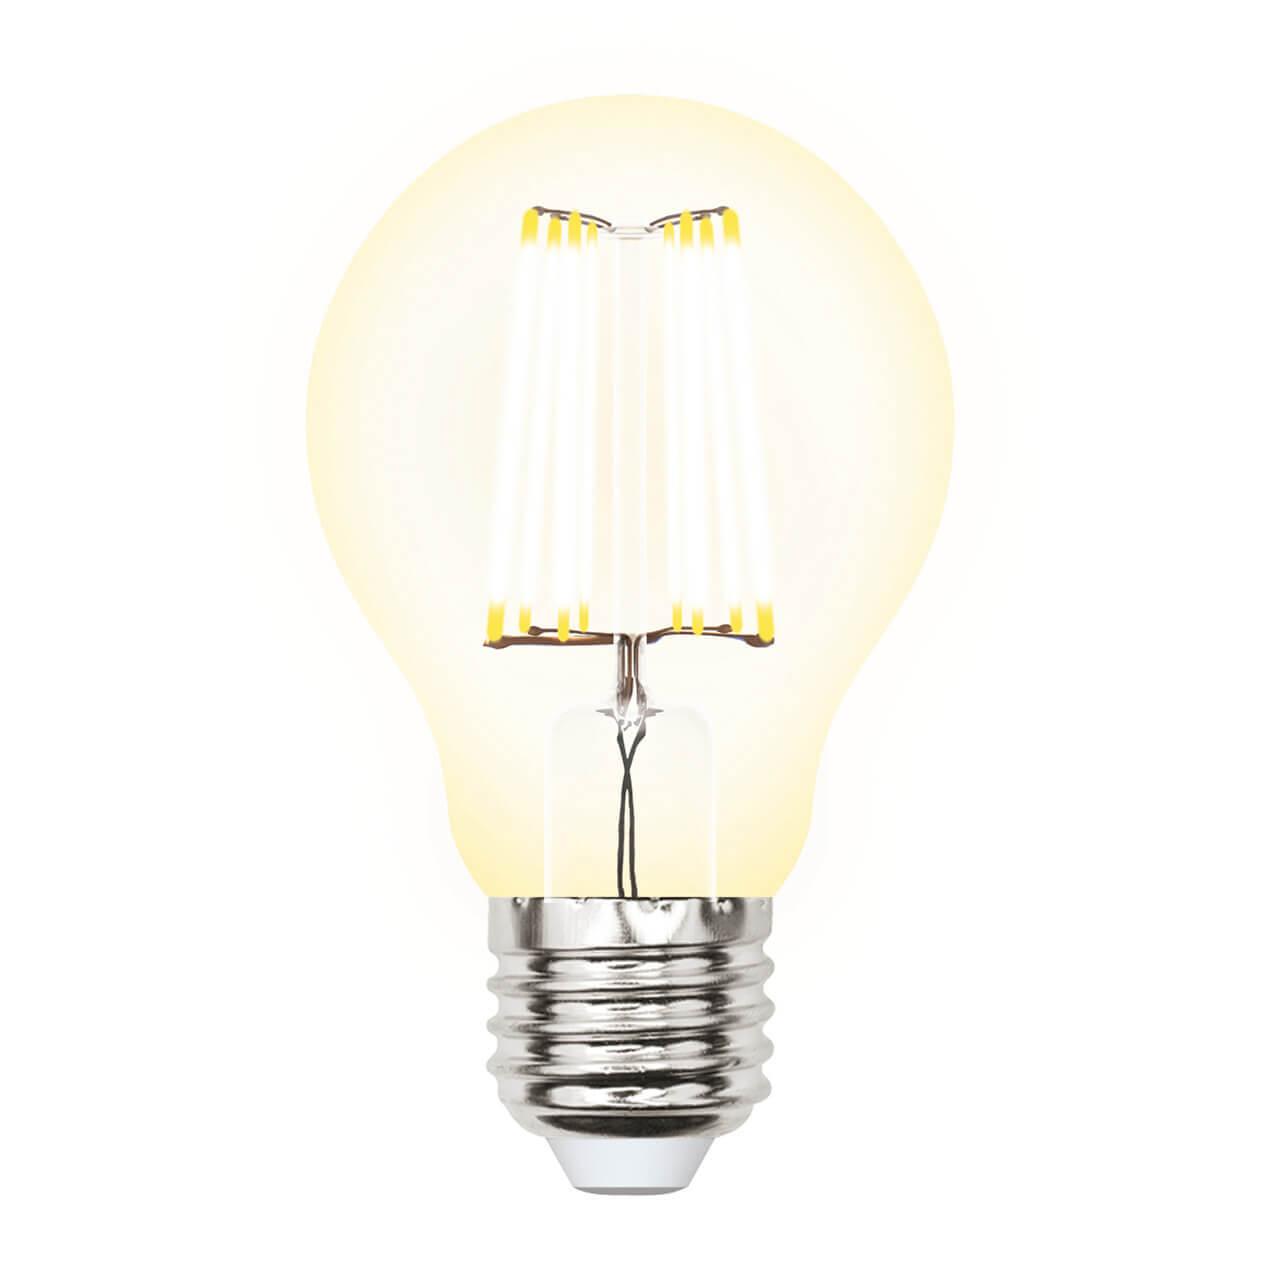 Лампа светодиодная филаментная (UL-00002625) Uniel E27 10W 3000K прозрачная LED-A60-10W/WW/E27/CL PLS02WH